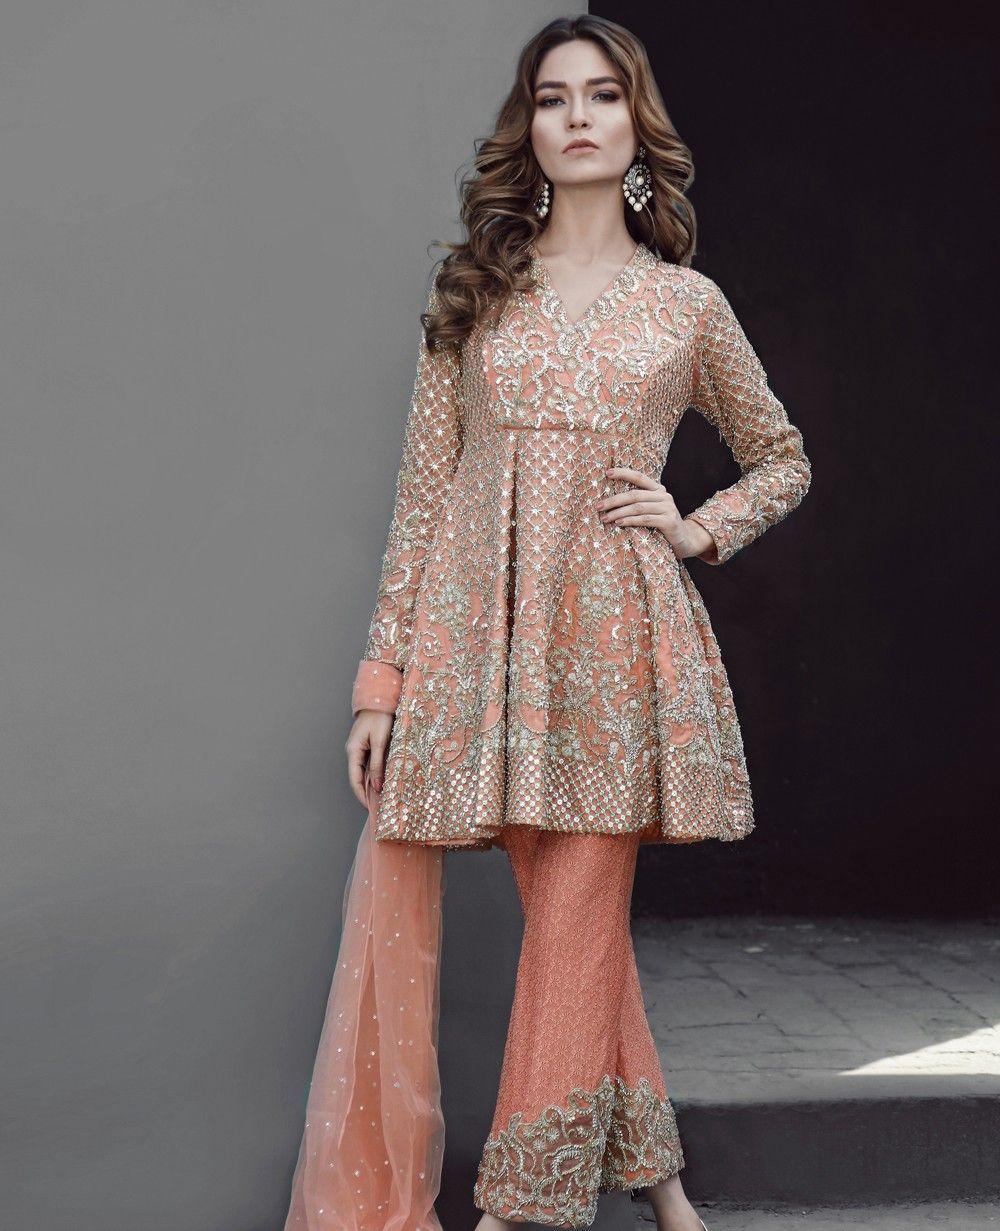 4ebb2baec2 Salwar Peplum cut peach 3 piece ready to wear dress by Republic luxury  collection 2019